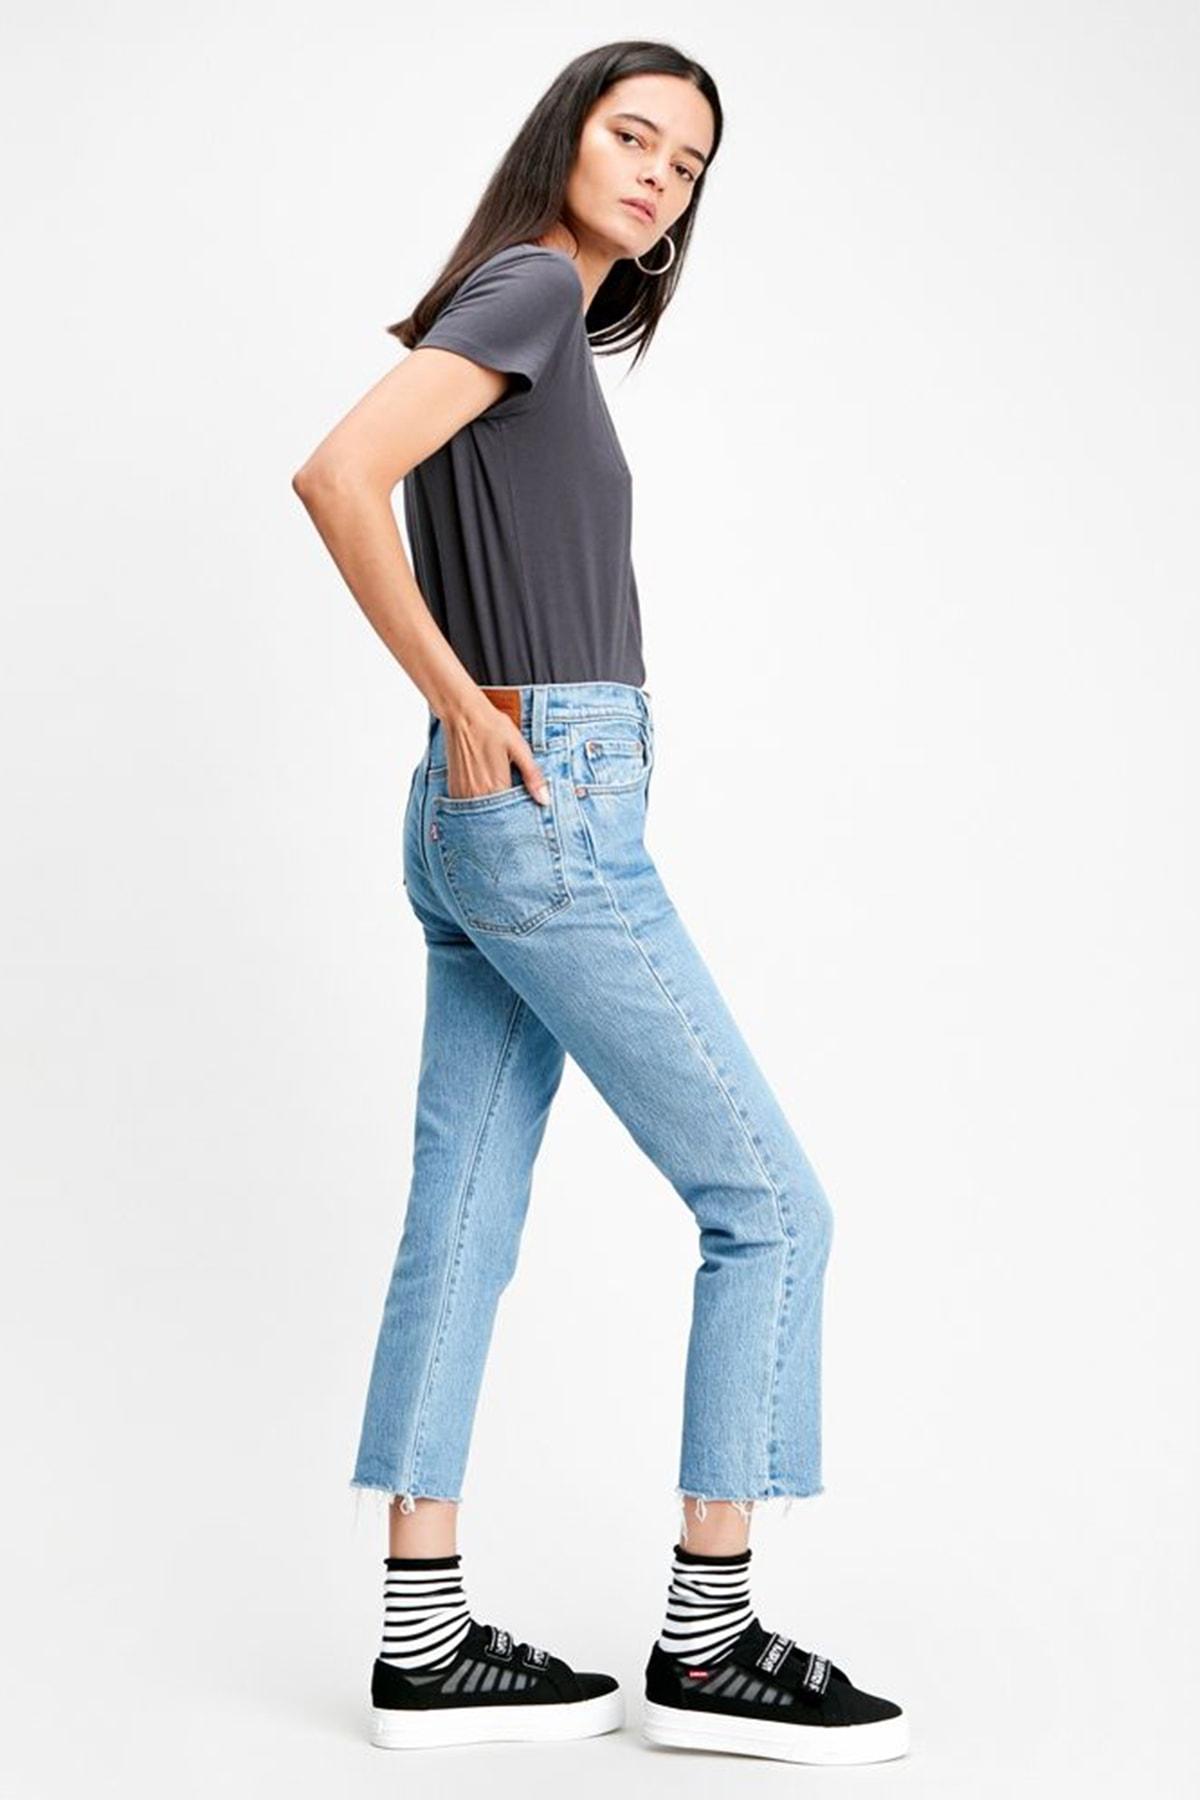 Levi's Kadın Mavi Yüksek Bel Pamuklu 501 Jeans 362000096 1